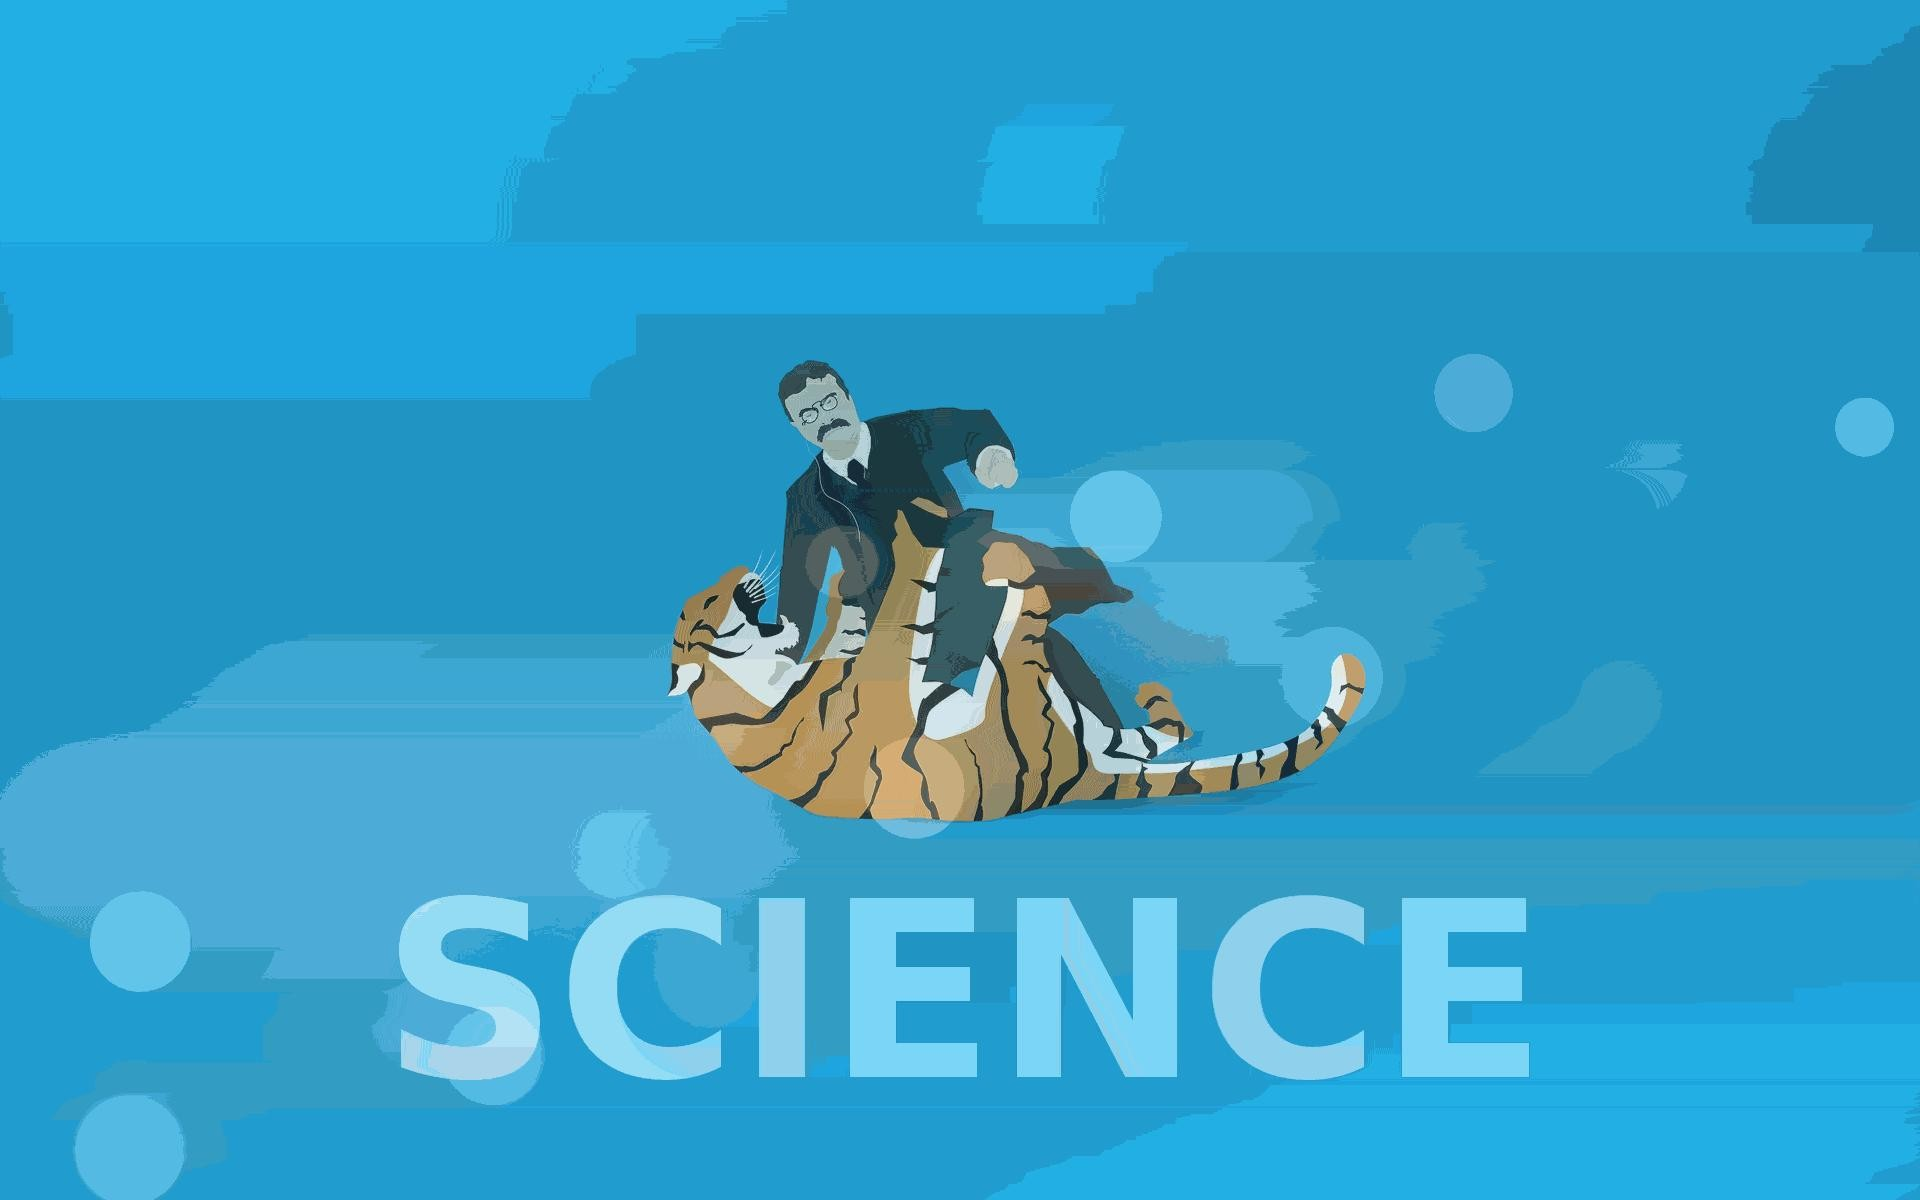 Science tigers badass teddy roosevelt wallpaper